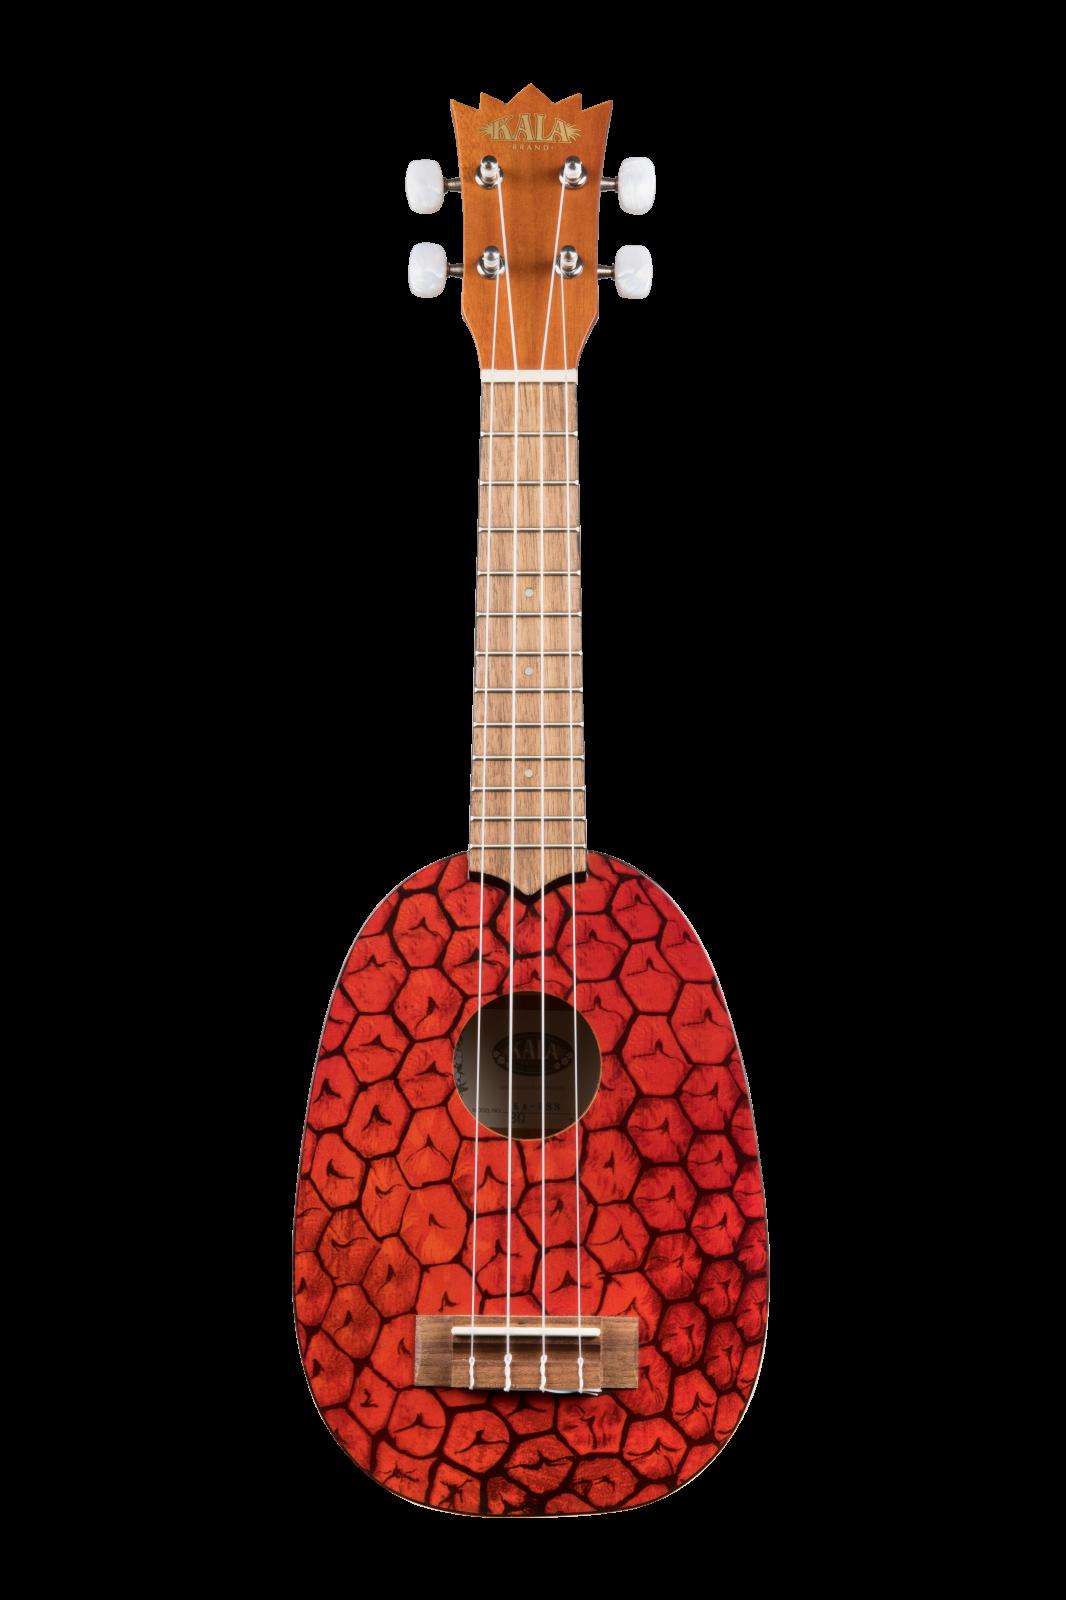 Kala KA-PSS Soprano Pineapple Ukulele